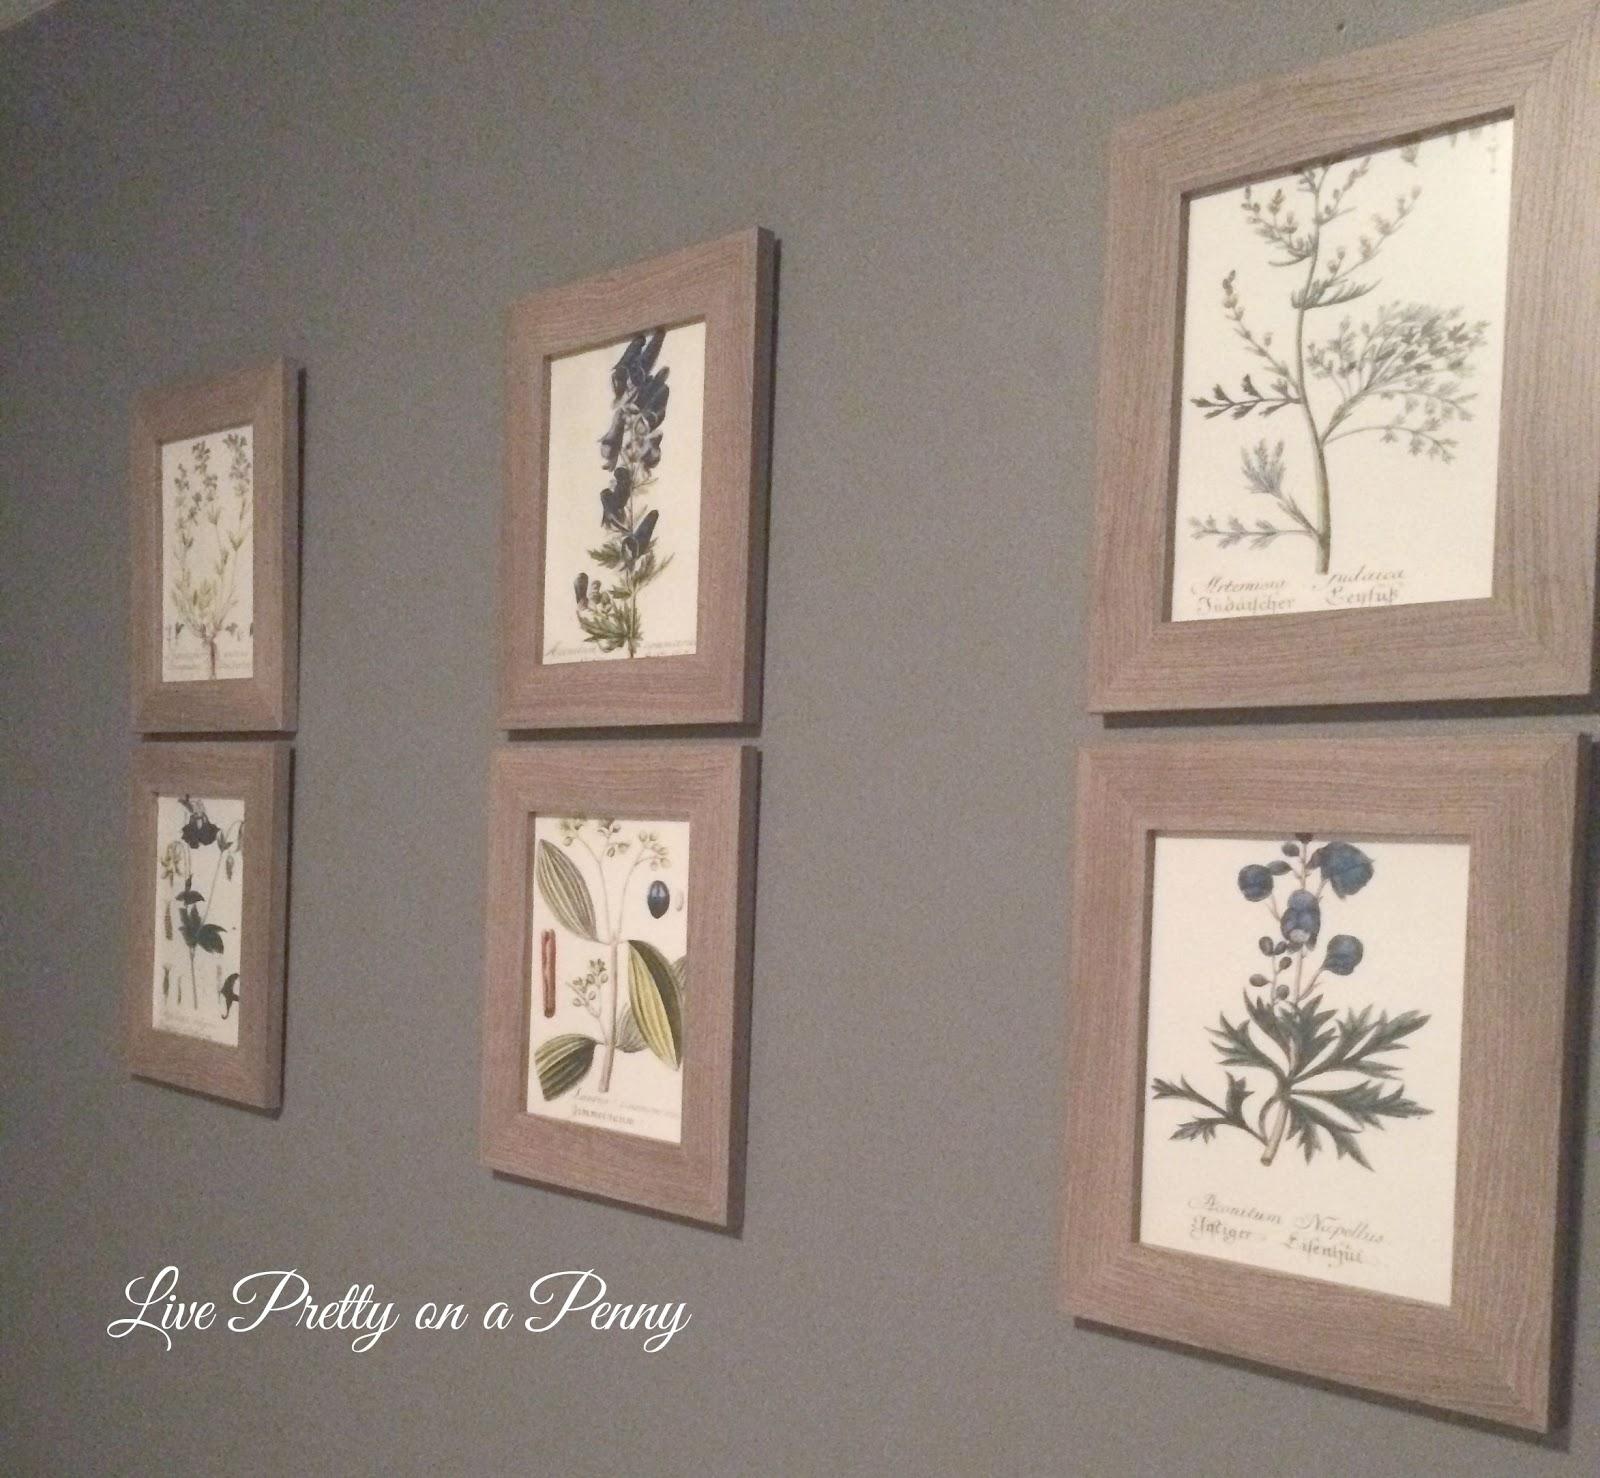 Free Printable Alert! Botanical Gallery Wall Art - Live Pretty on a